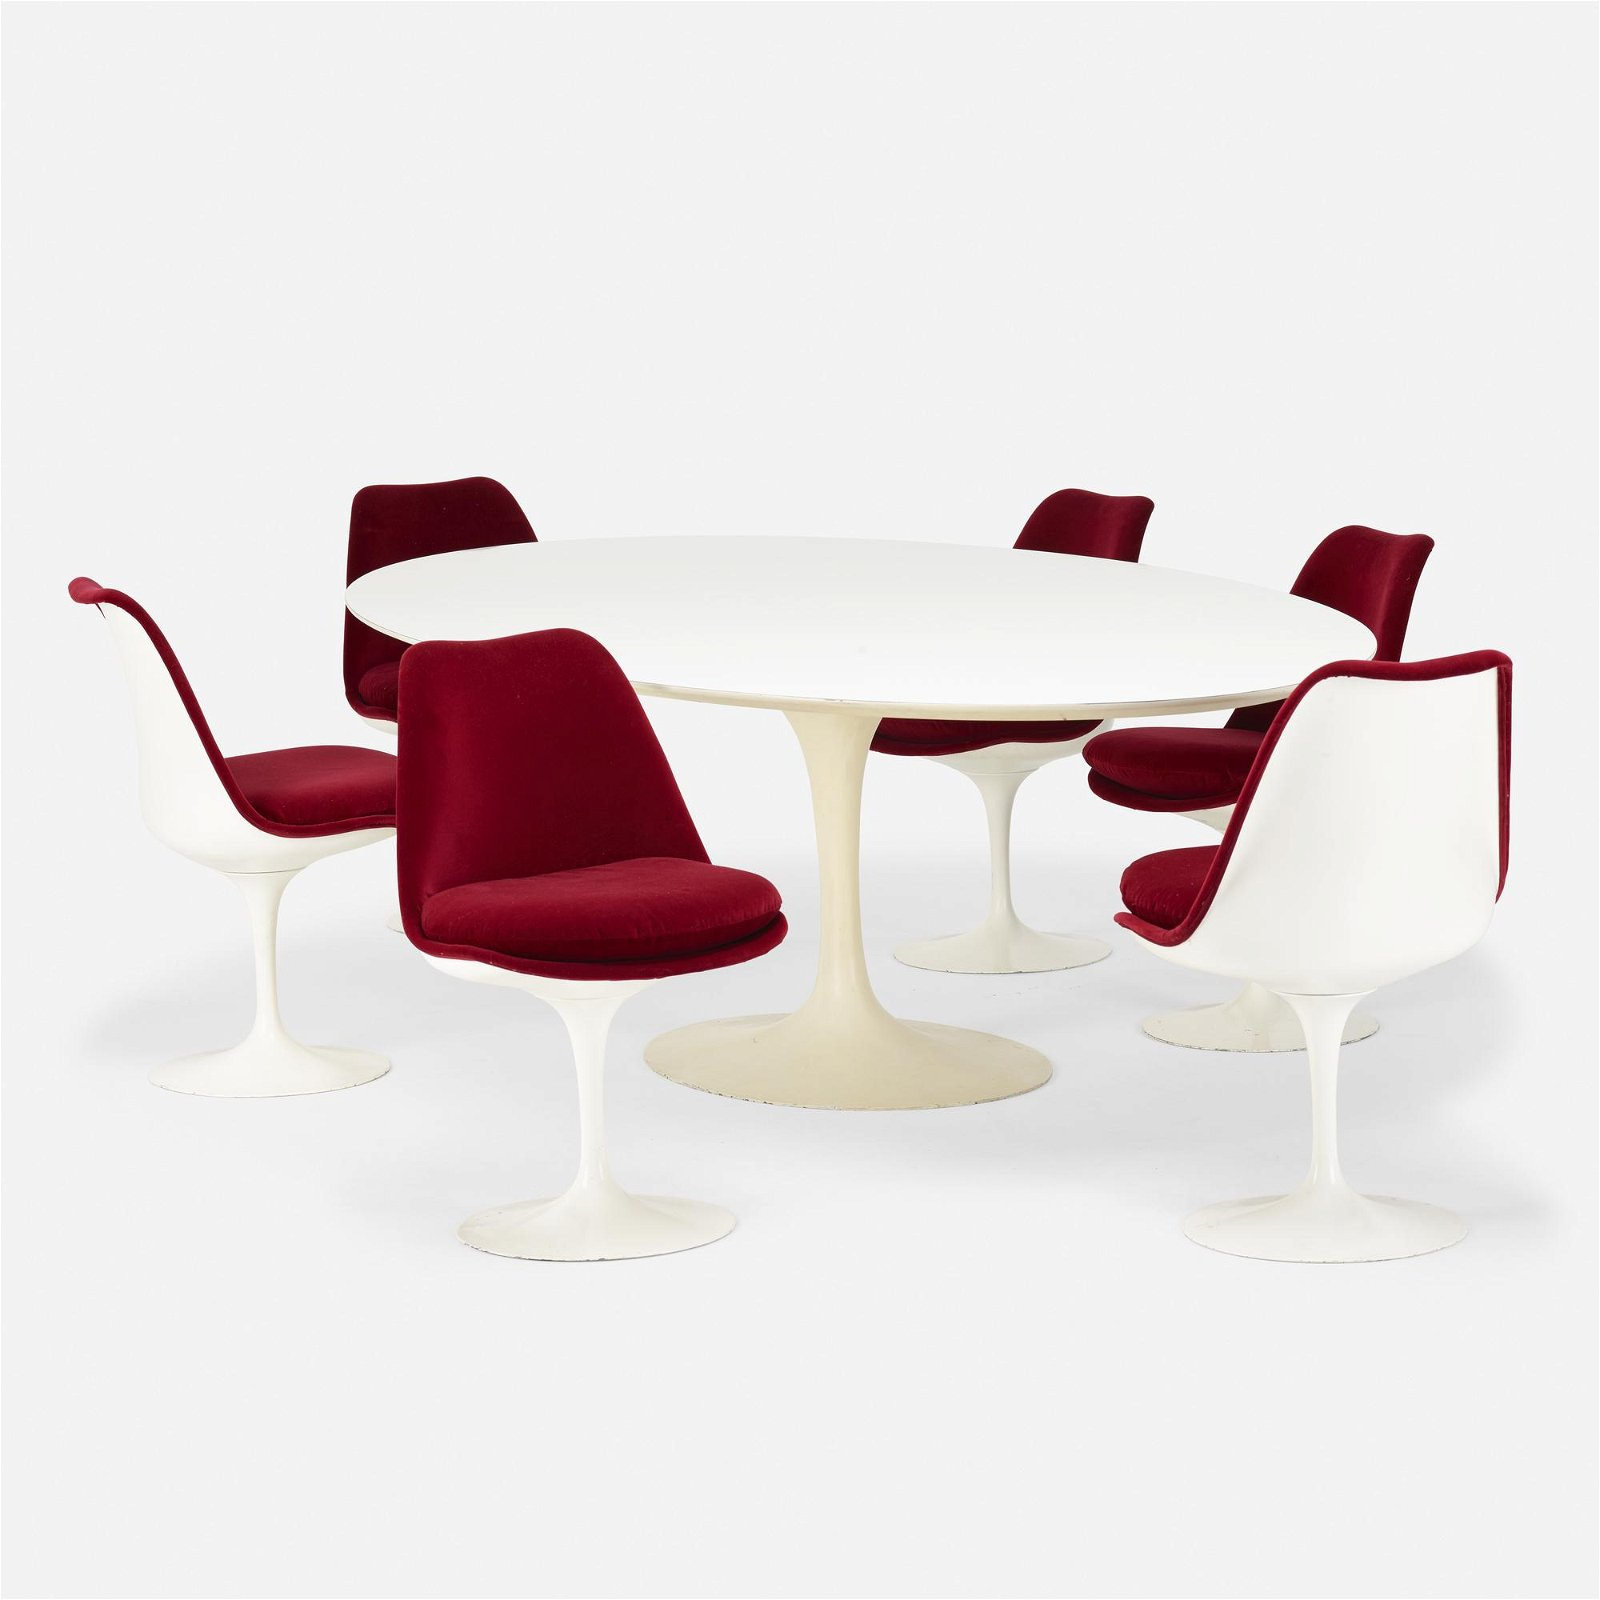 Eero Saarinen, Tulip table and chairs, set of six